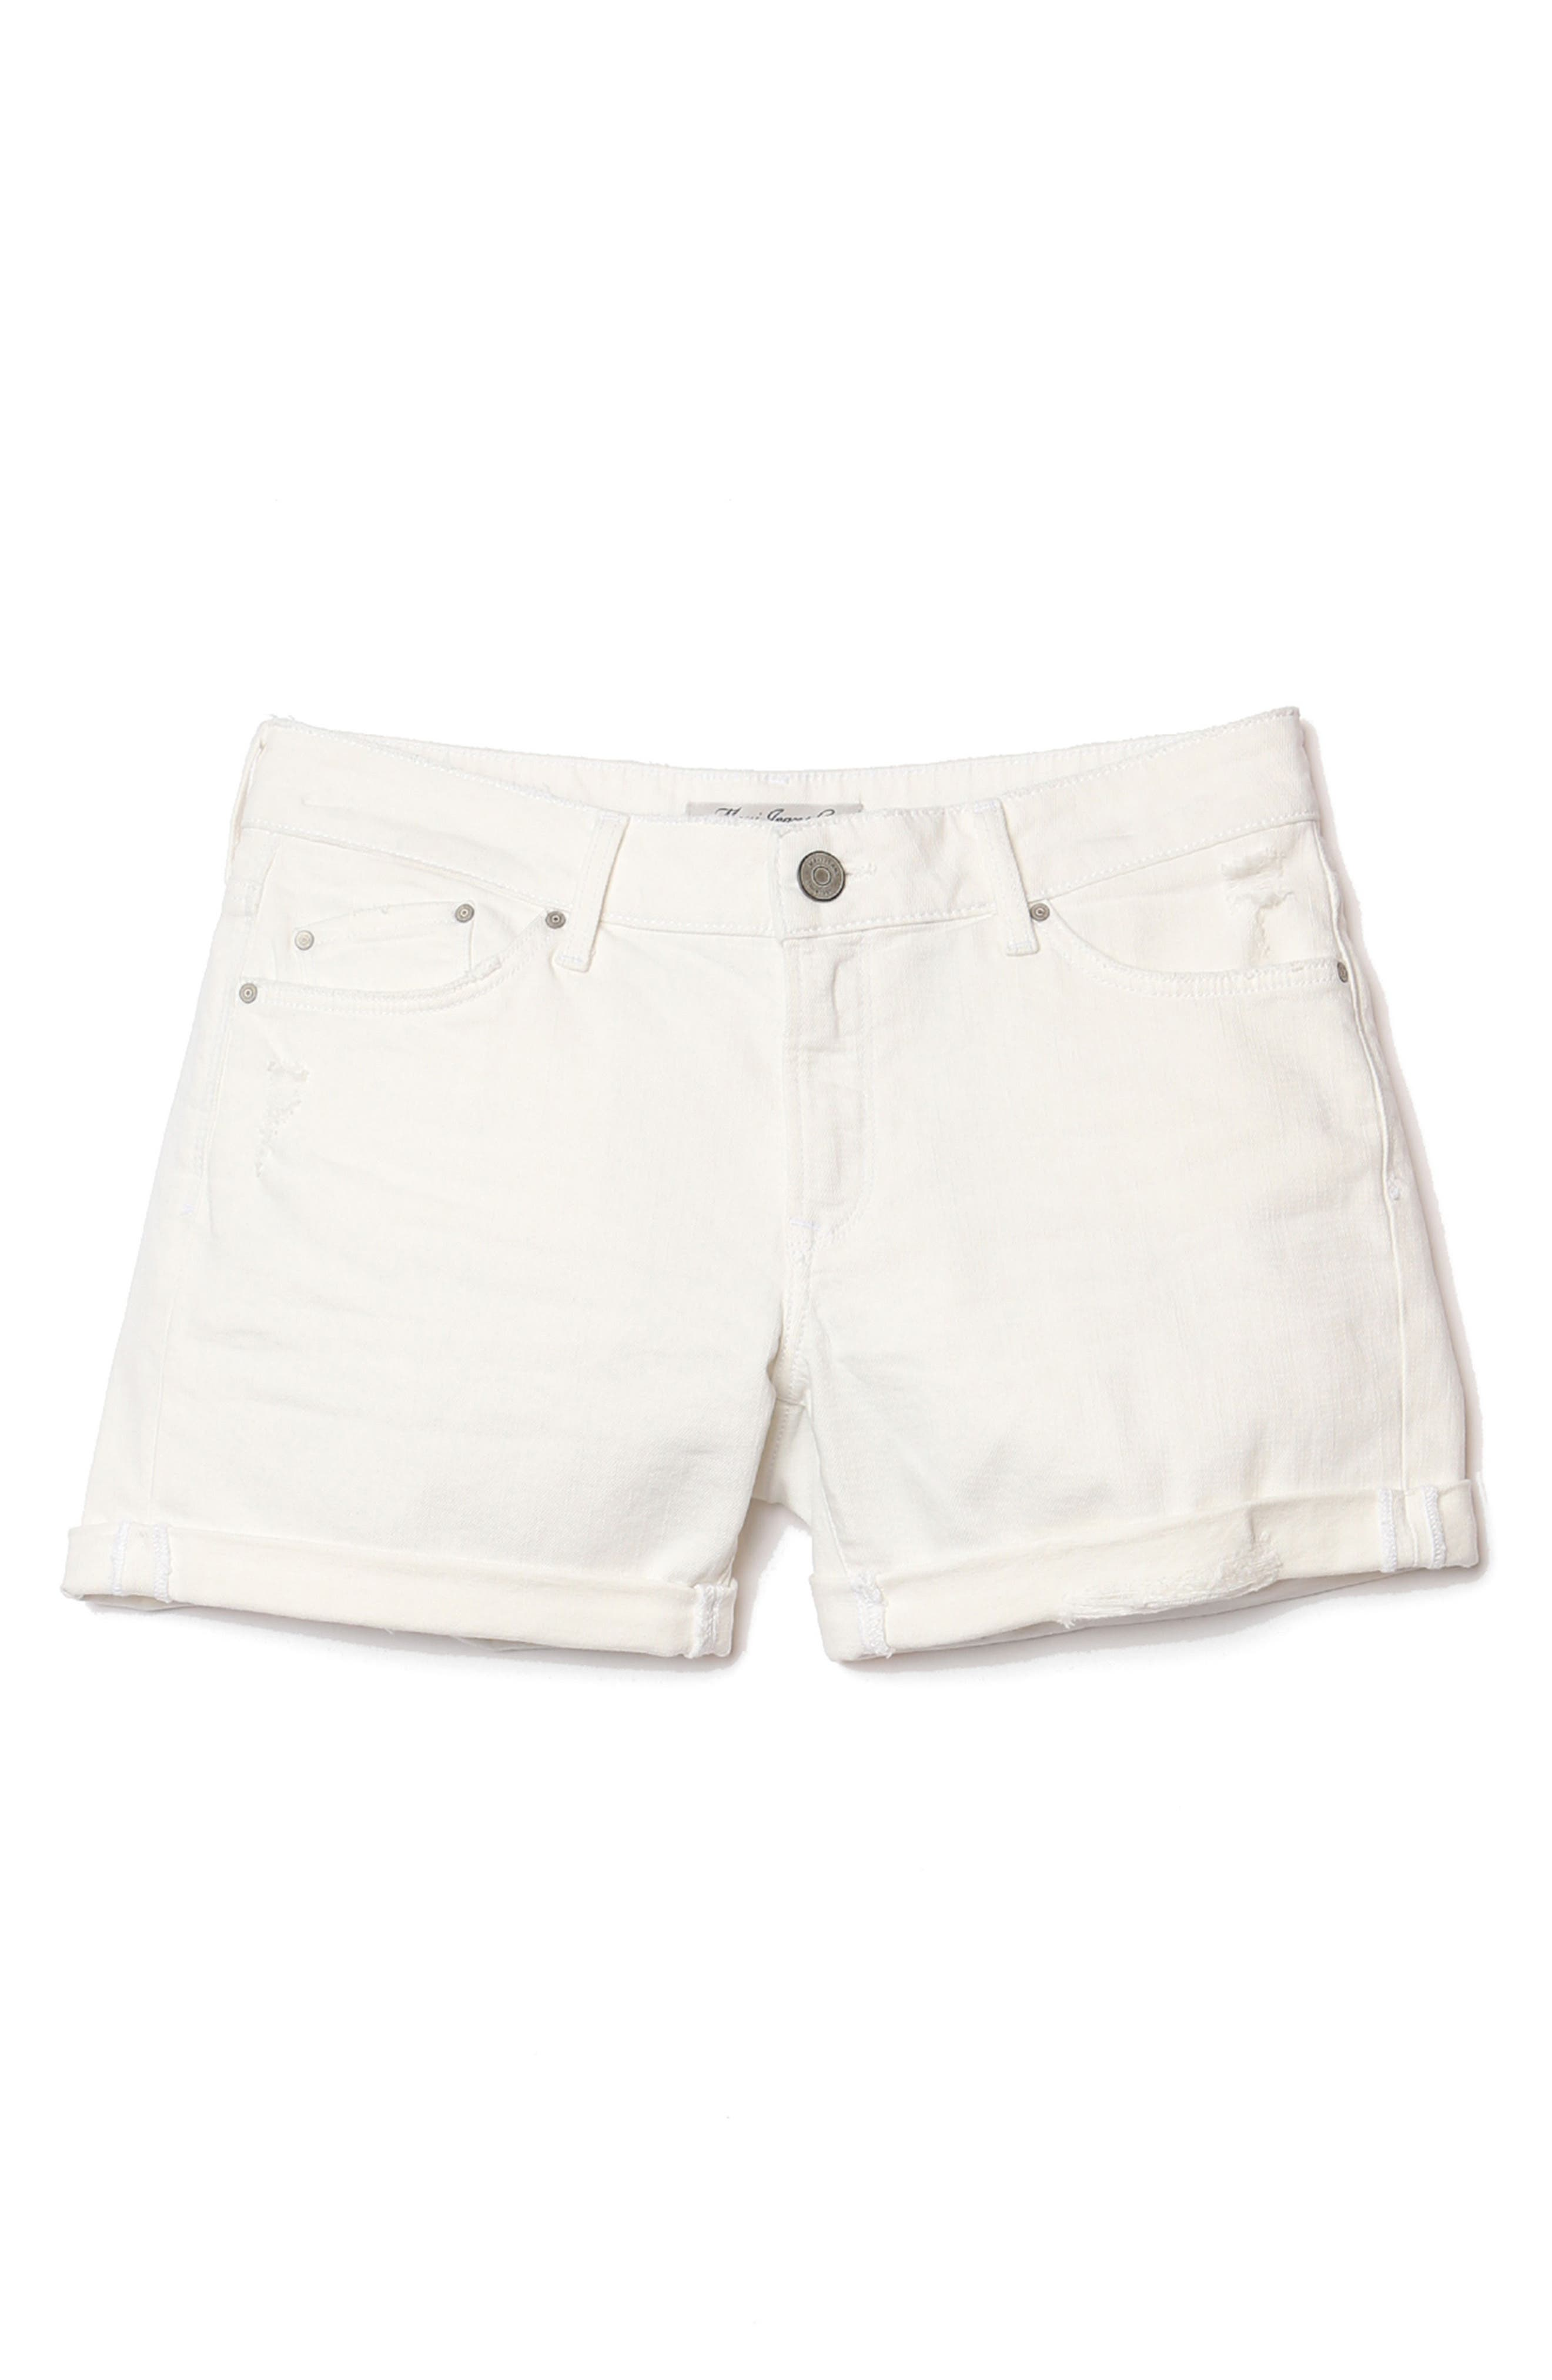 Pixie Ripped Denim Shorts,                             Alternate thumbnail 4, color,                             WHITE RIPPED NOLITA